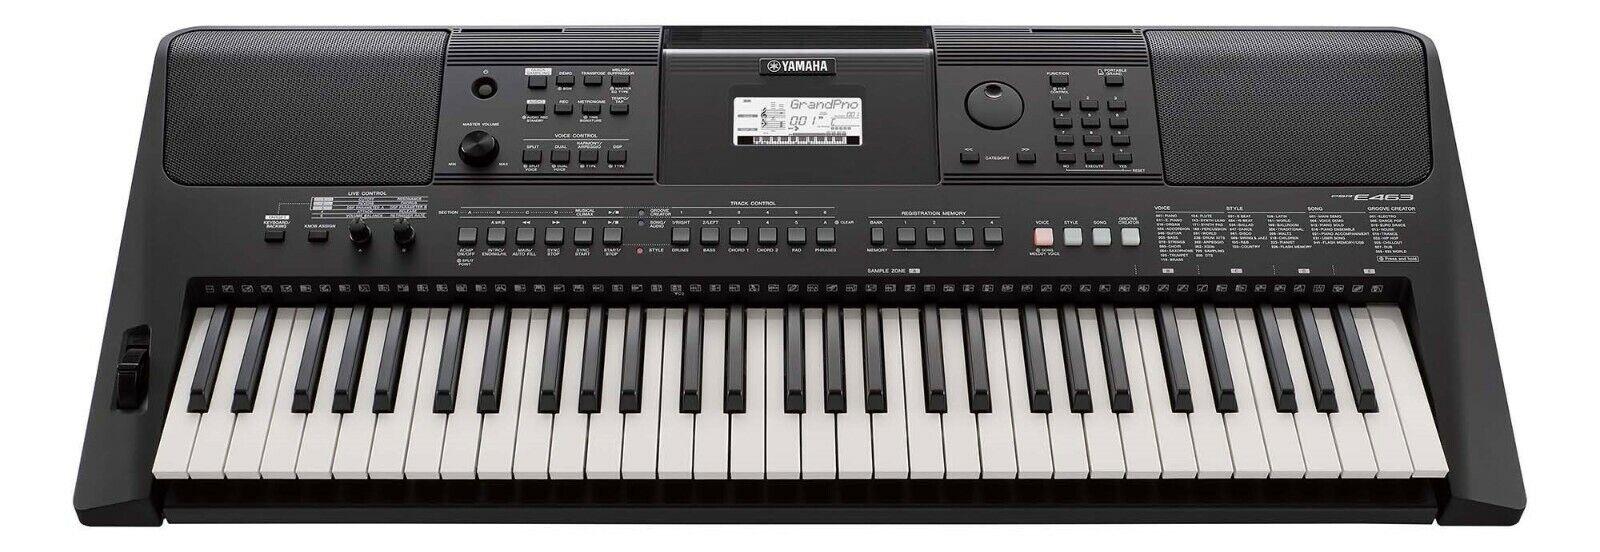 psr e463 portable keyboard